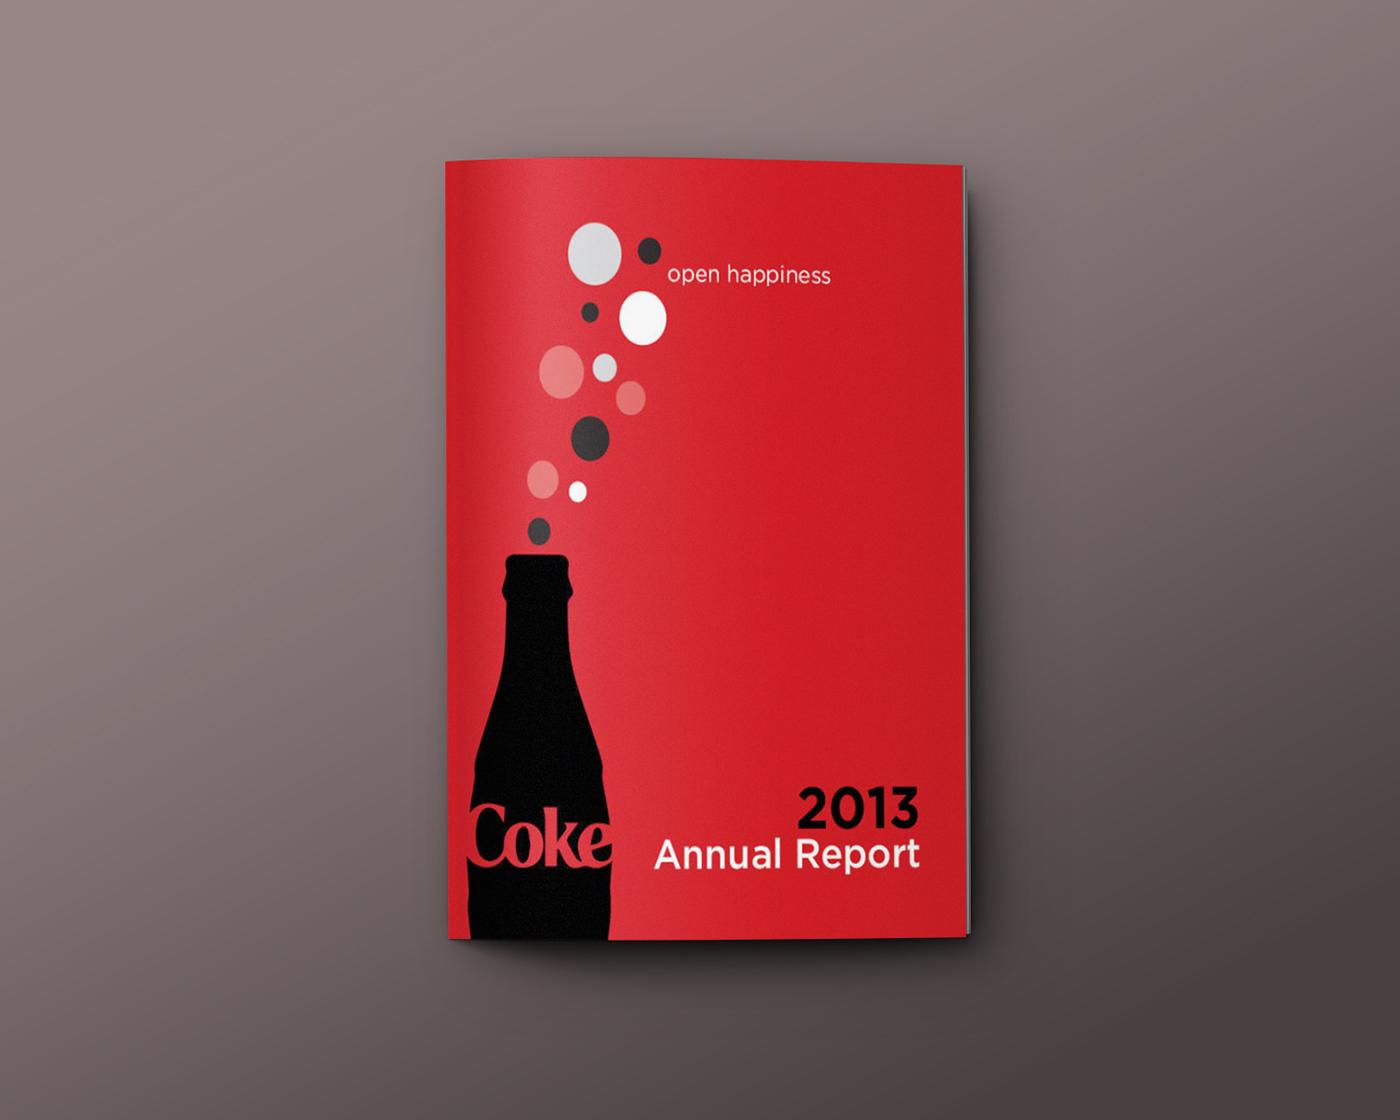 coca cola annual report Get sec filings for coca-cola co (ko), including annual report (10k) and quarterly report (10q.